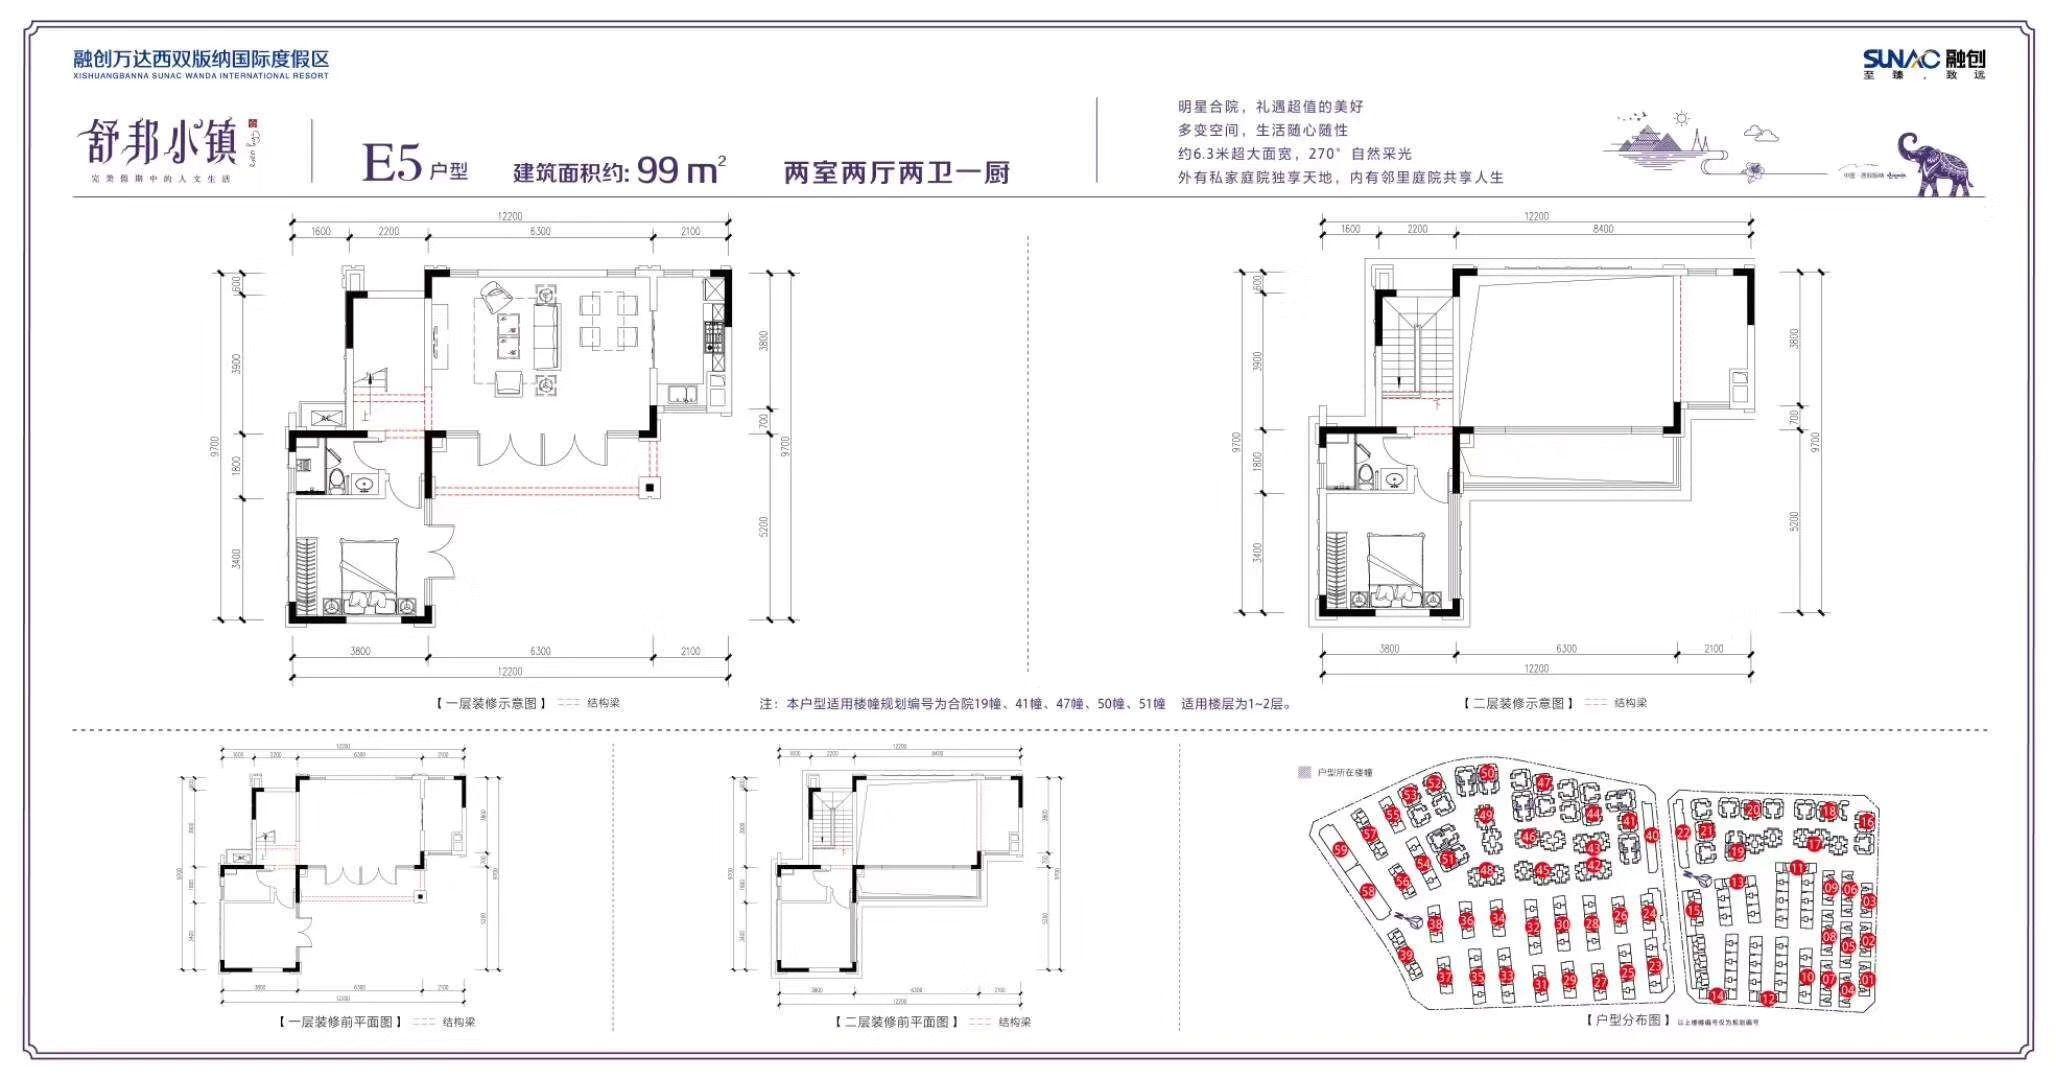 E5户型 2室2厅2卫1厨 建筑面积:99㎡